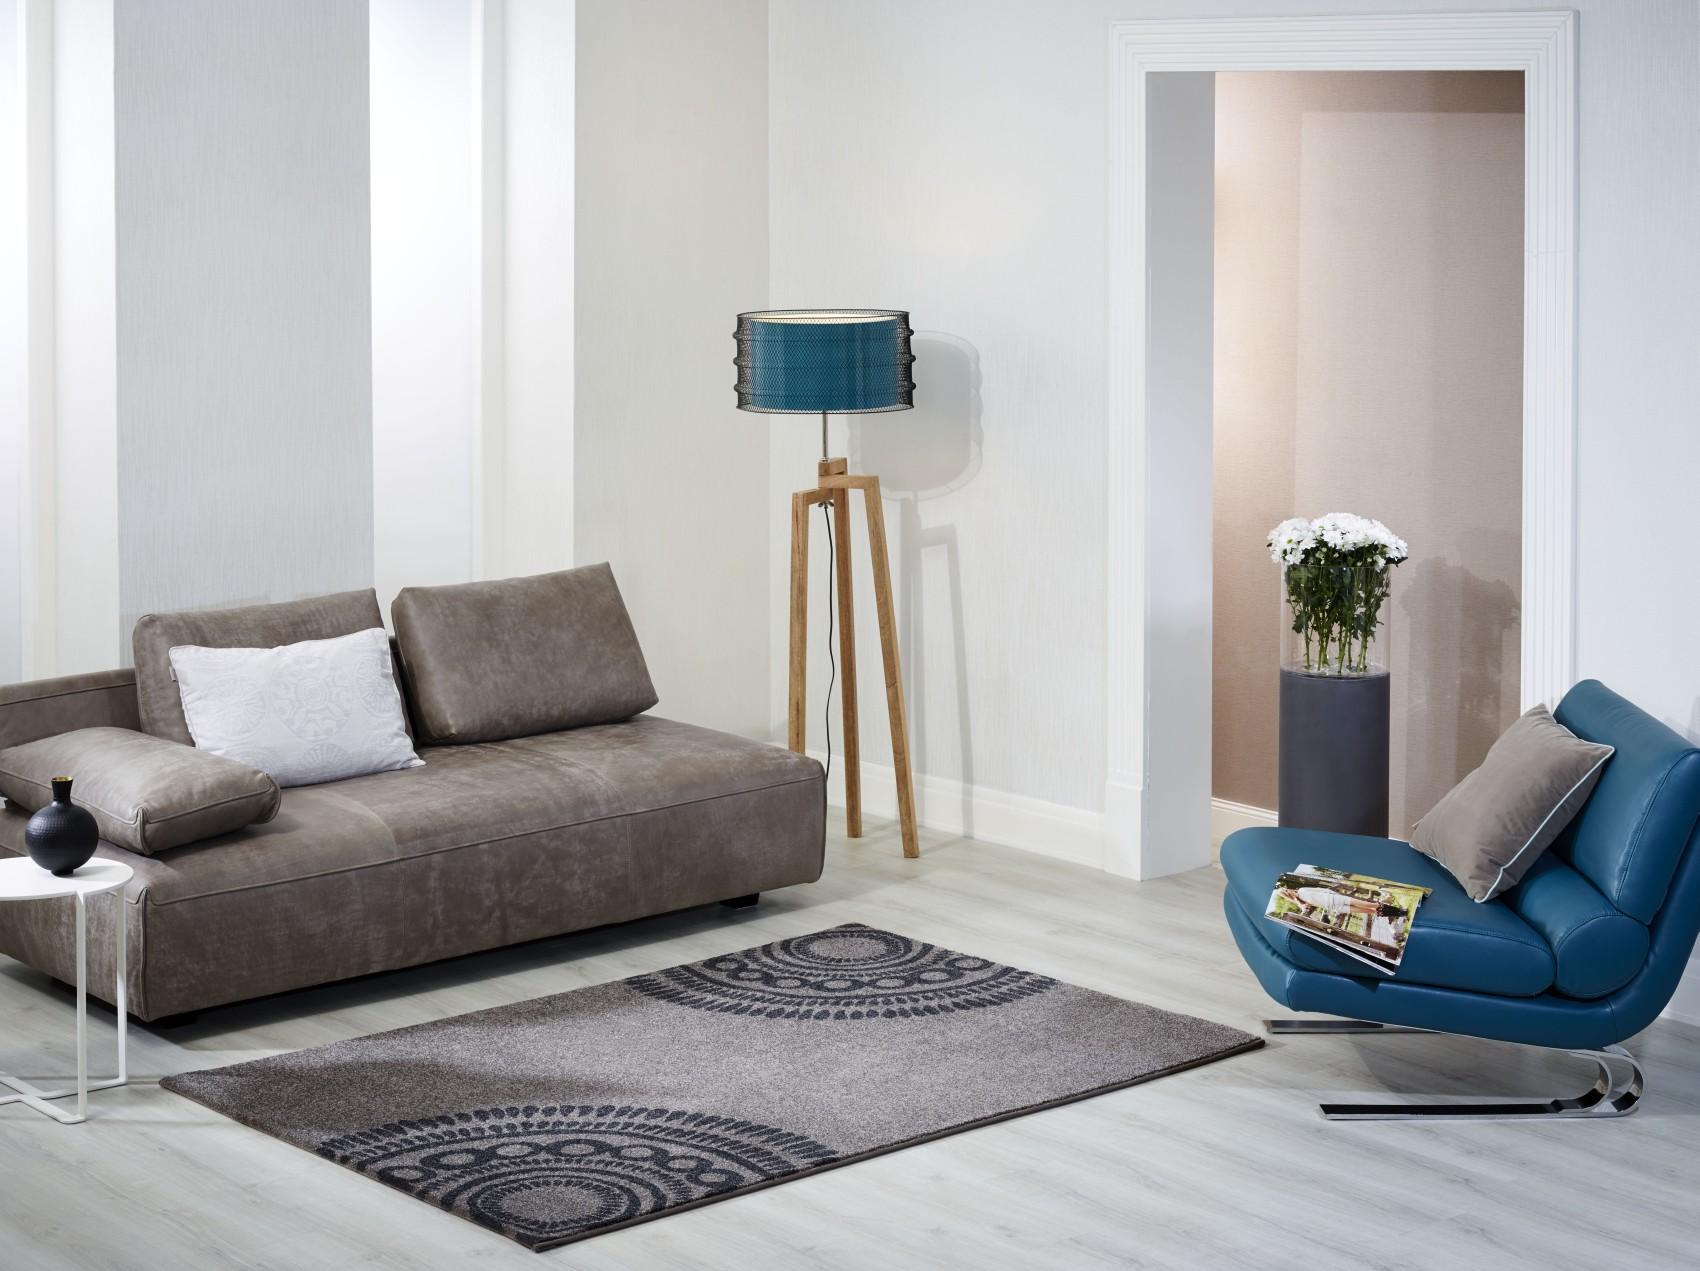 b b home passion carpets reinkemeier rietberg trade logistics shopfitting. Black Bedroom Furniture Sets. Home Design Ideas